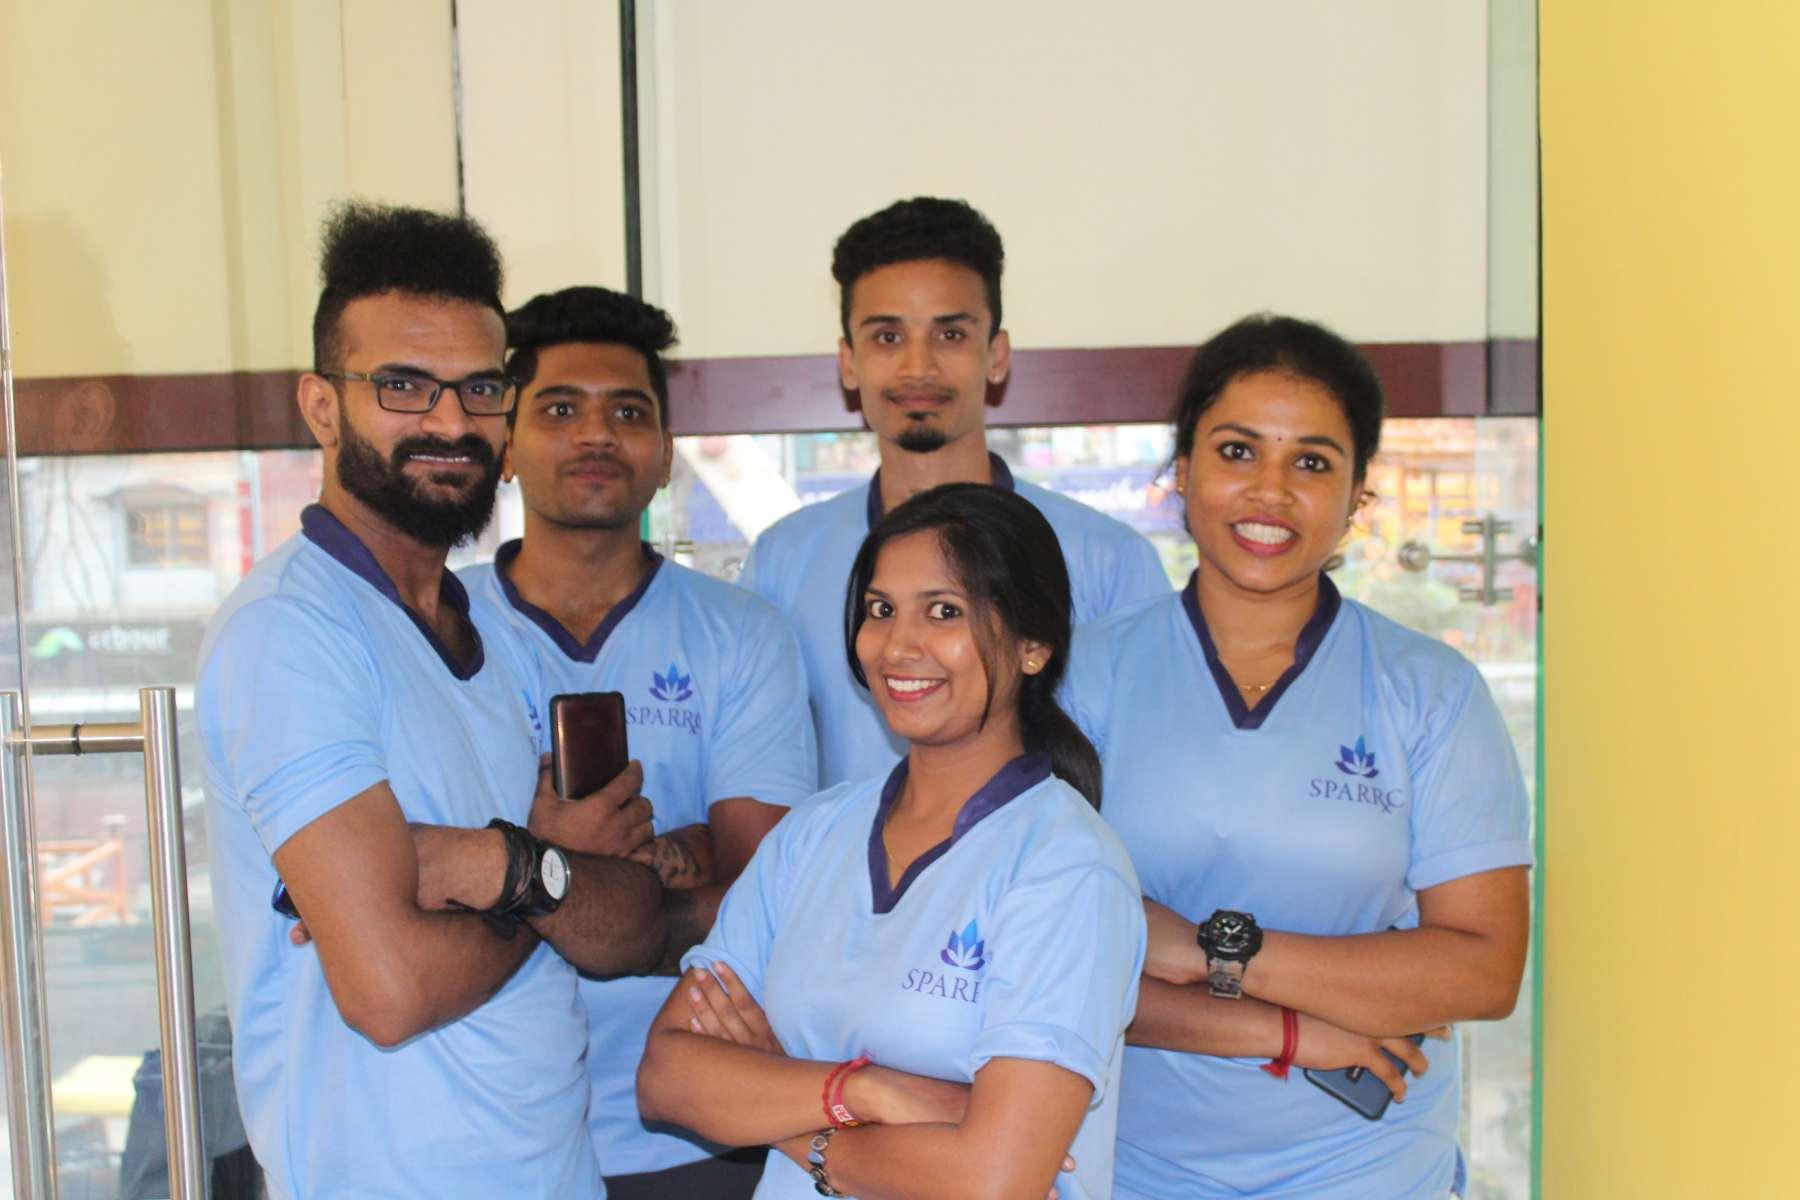 SPARRC team members